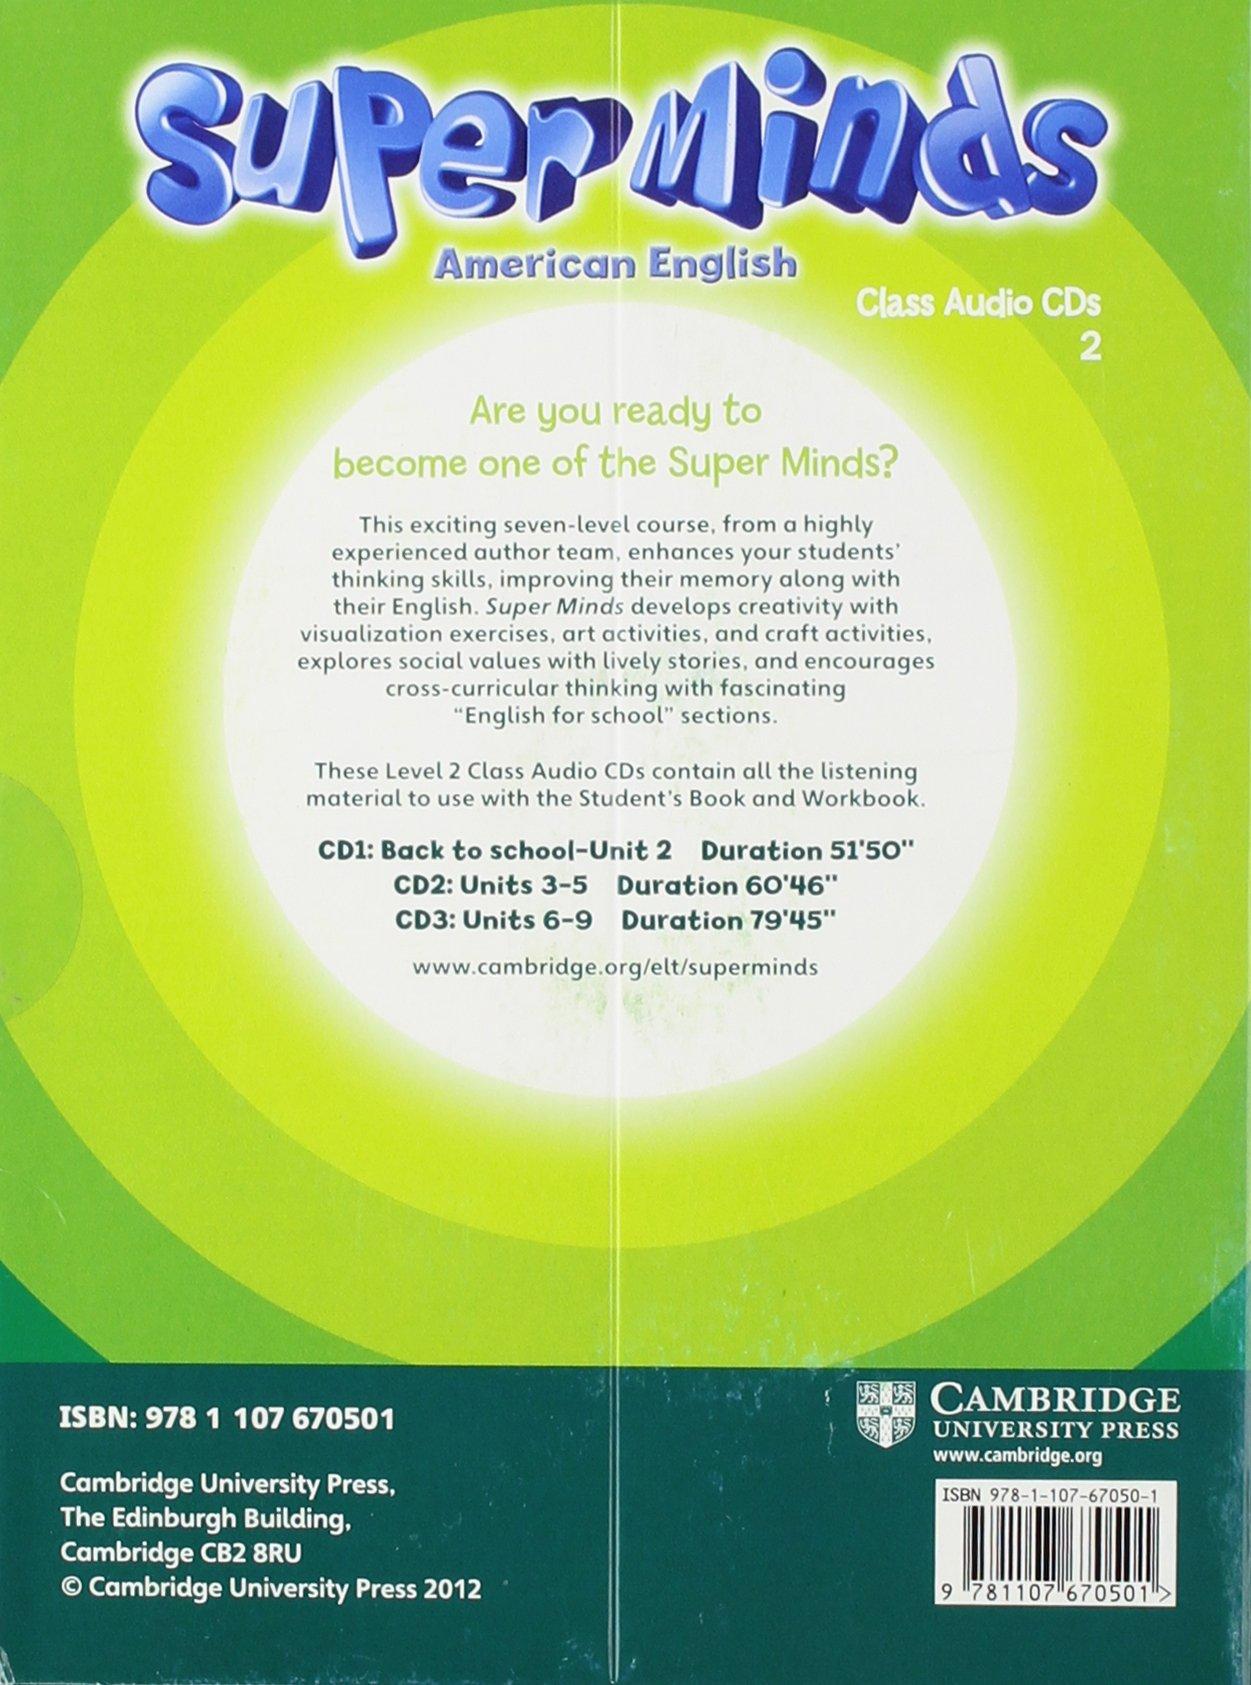 Super Minds American English Level 2 Class Audio CDs (3